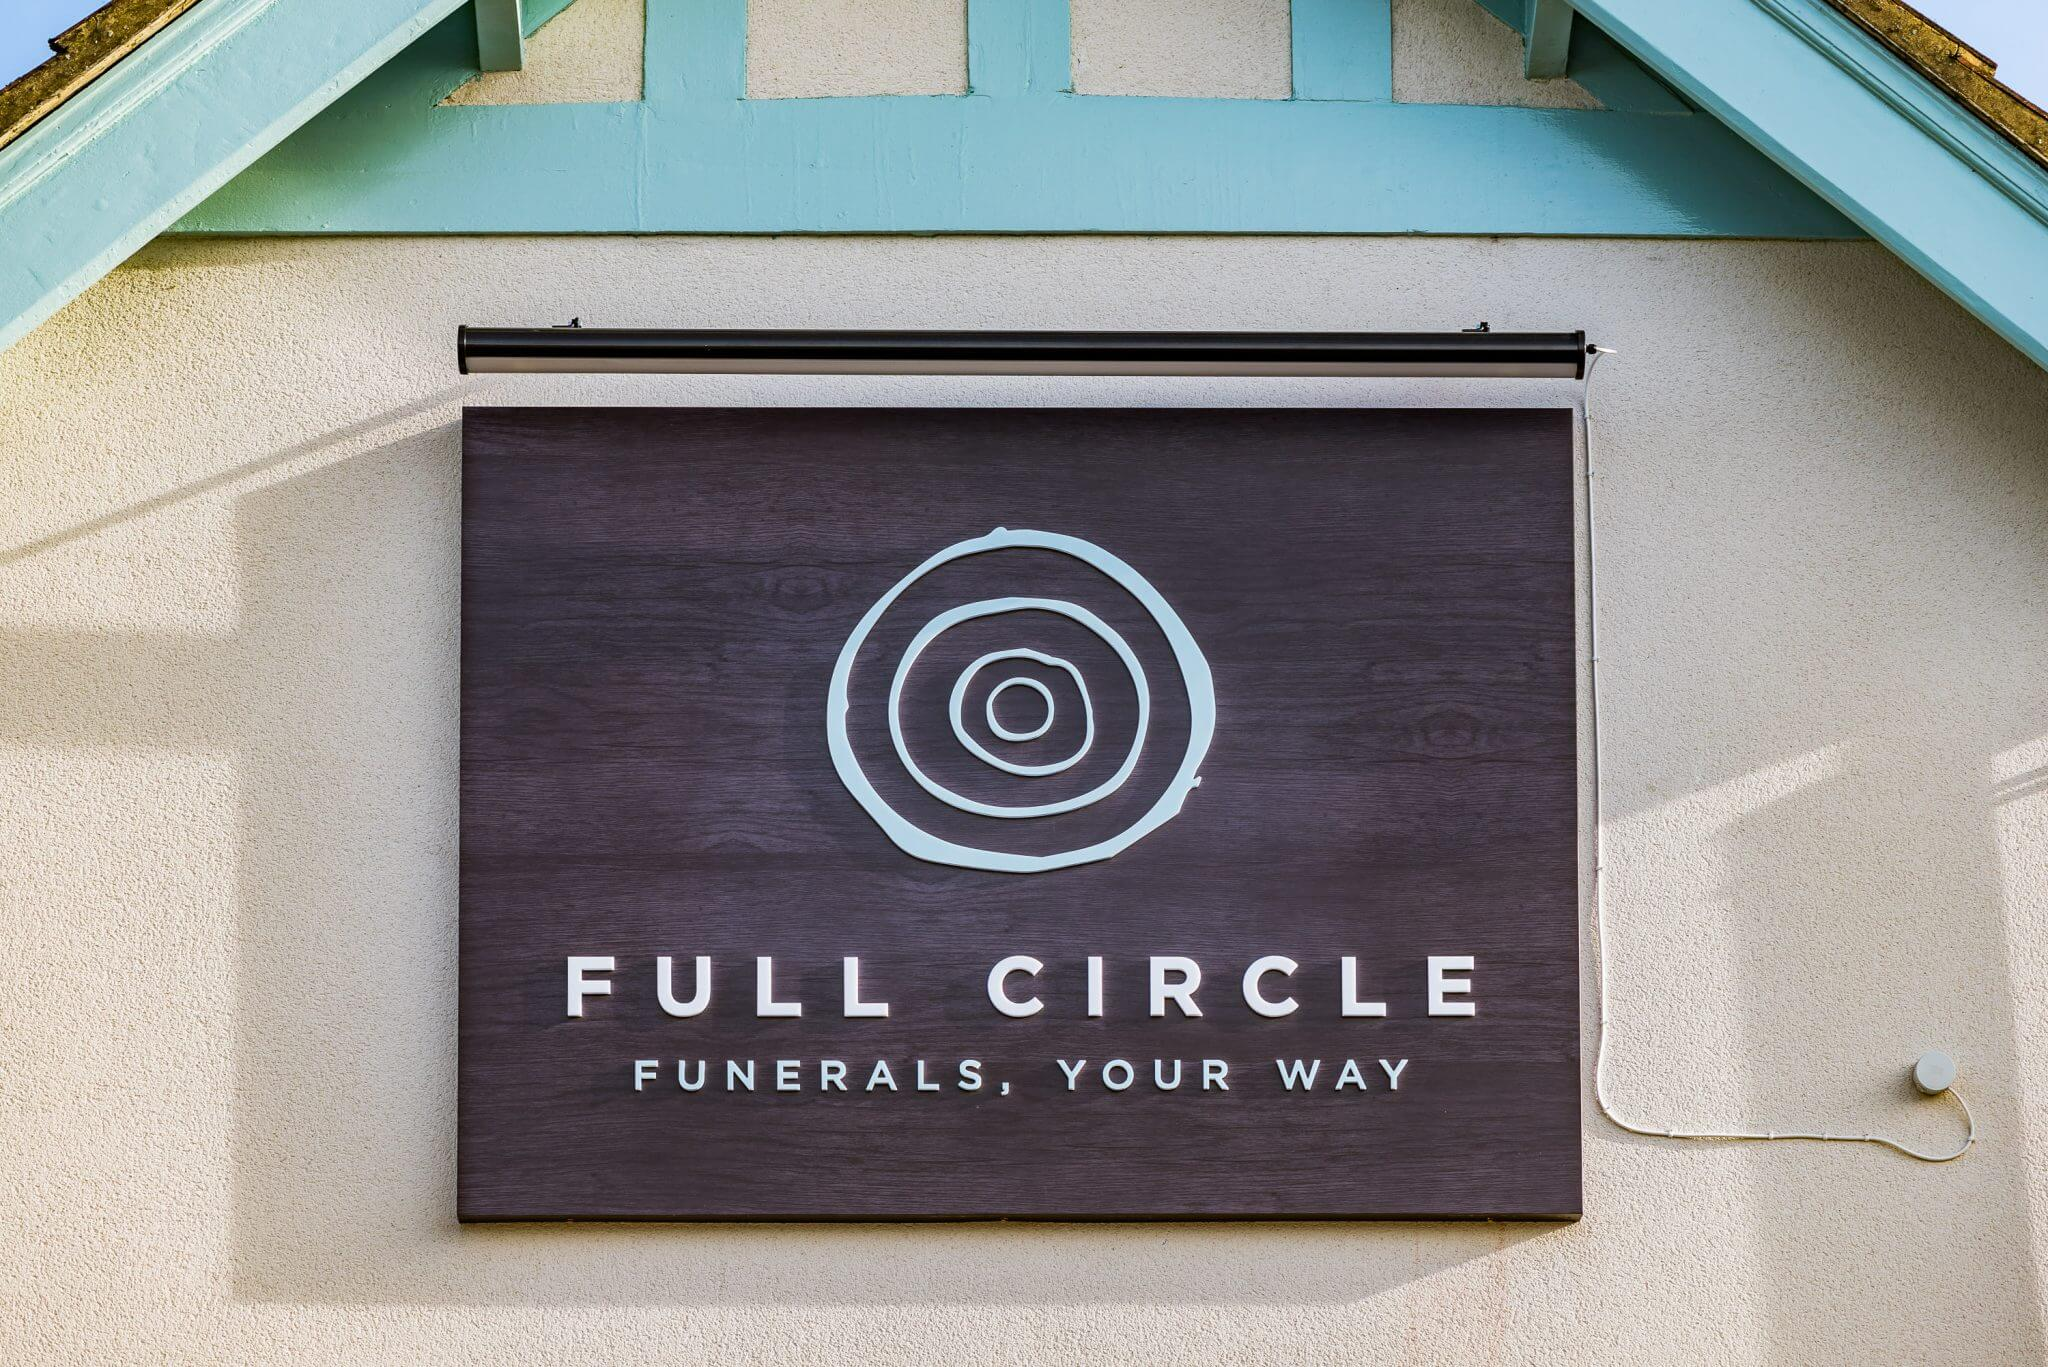 Full Circle sign